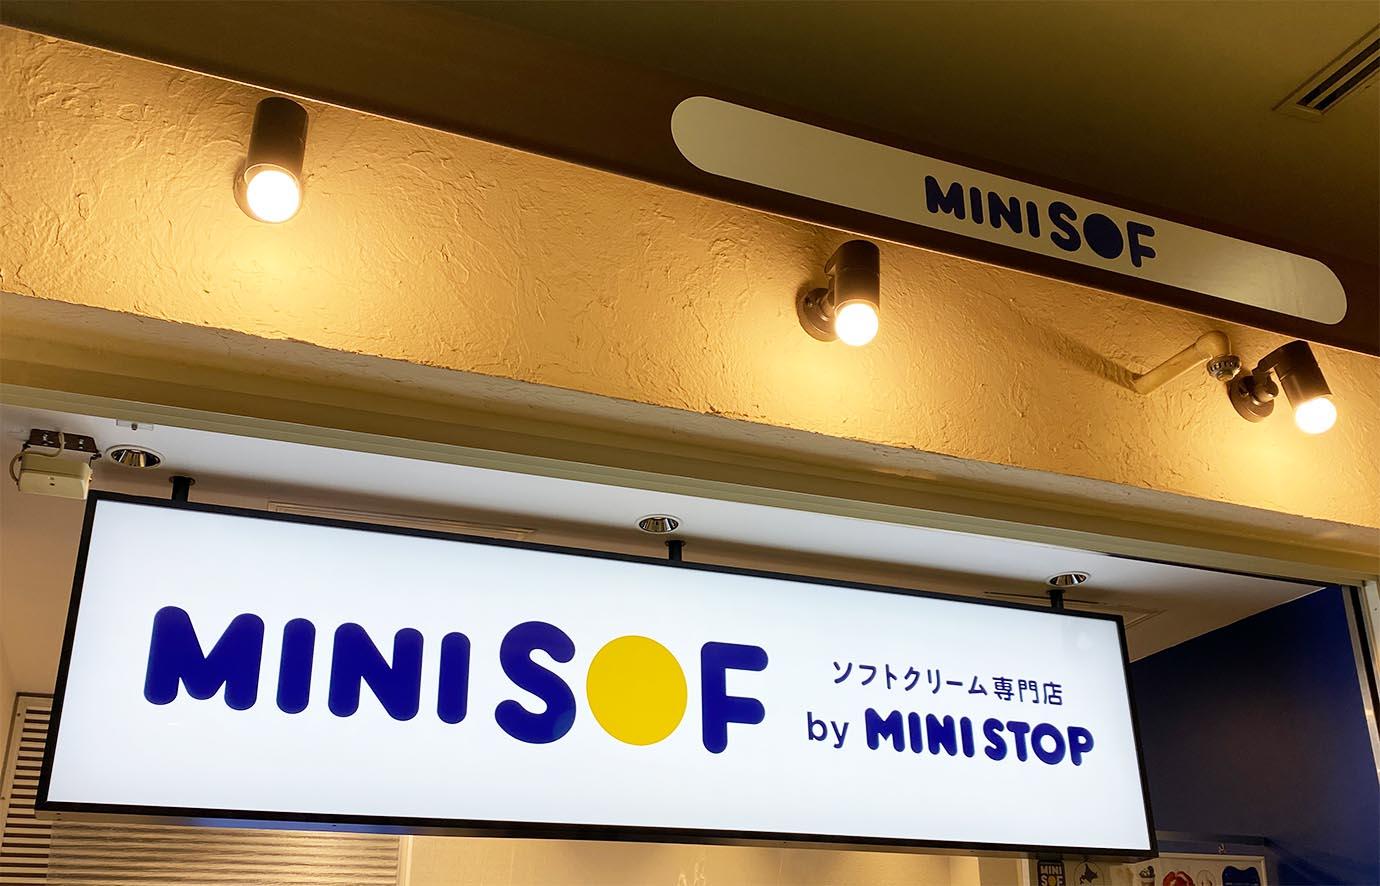 minisoft3